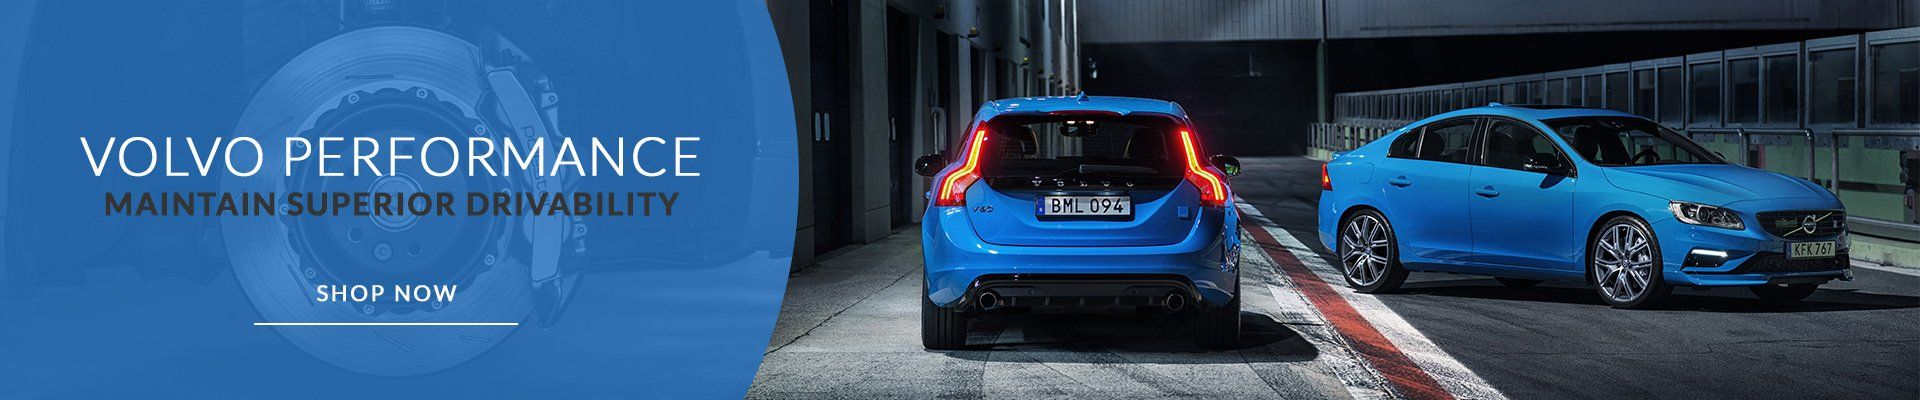 Volvo Performance